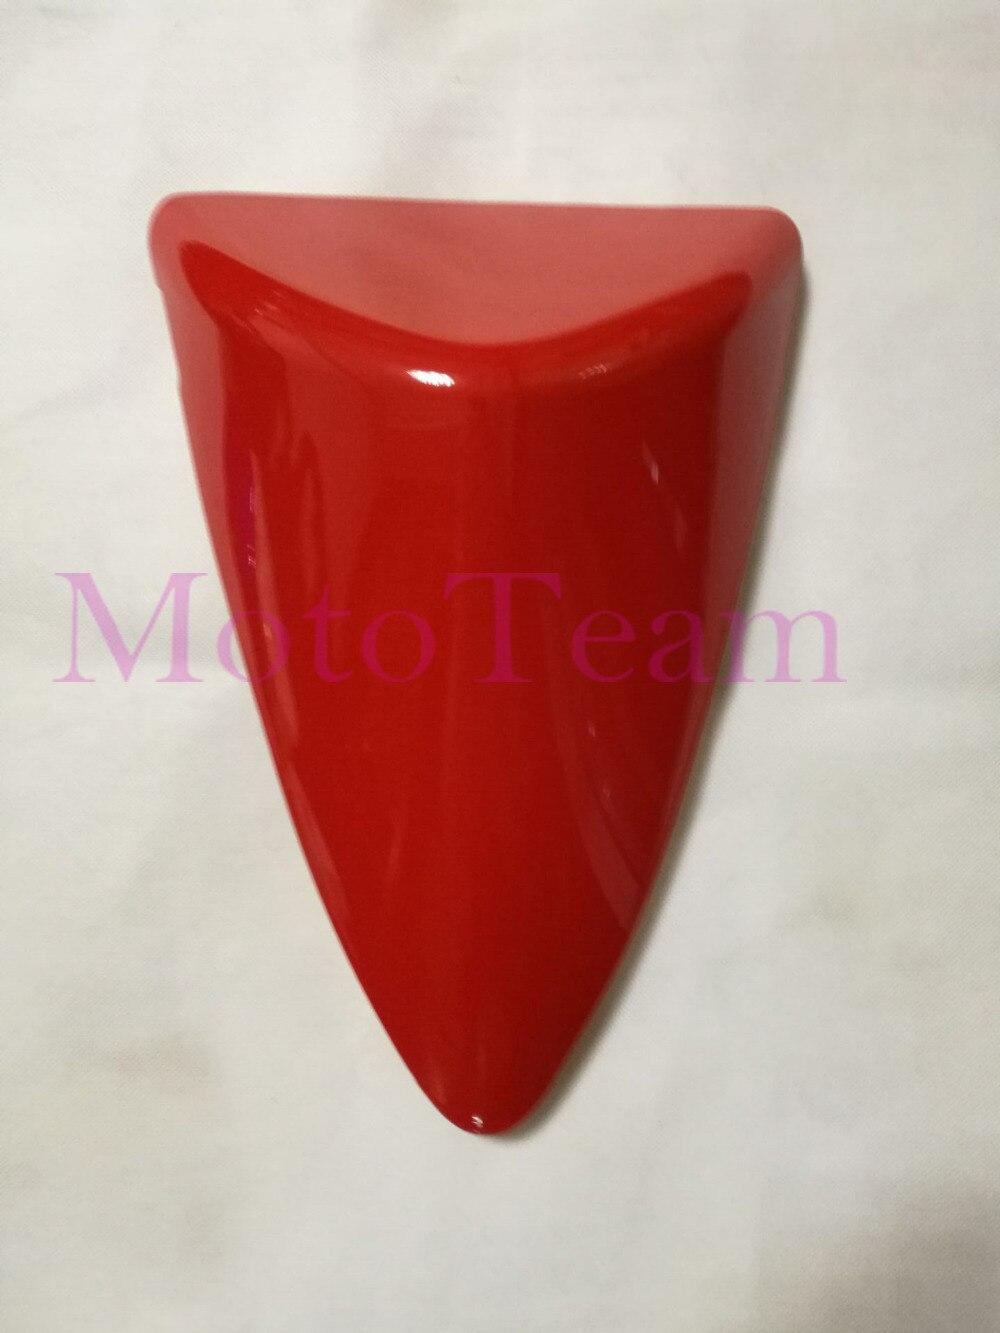 Hot Red Rear Tail Seat Cover Cowl Fairing For KAWASAKI NINJA ZX6R 636 2005-2006